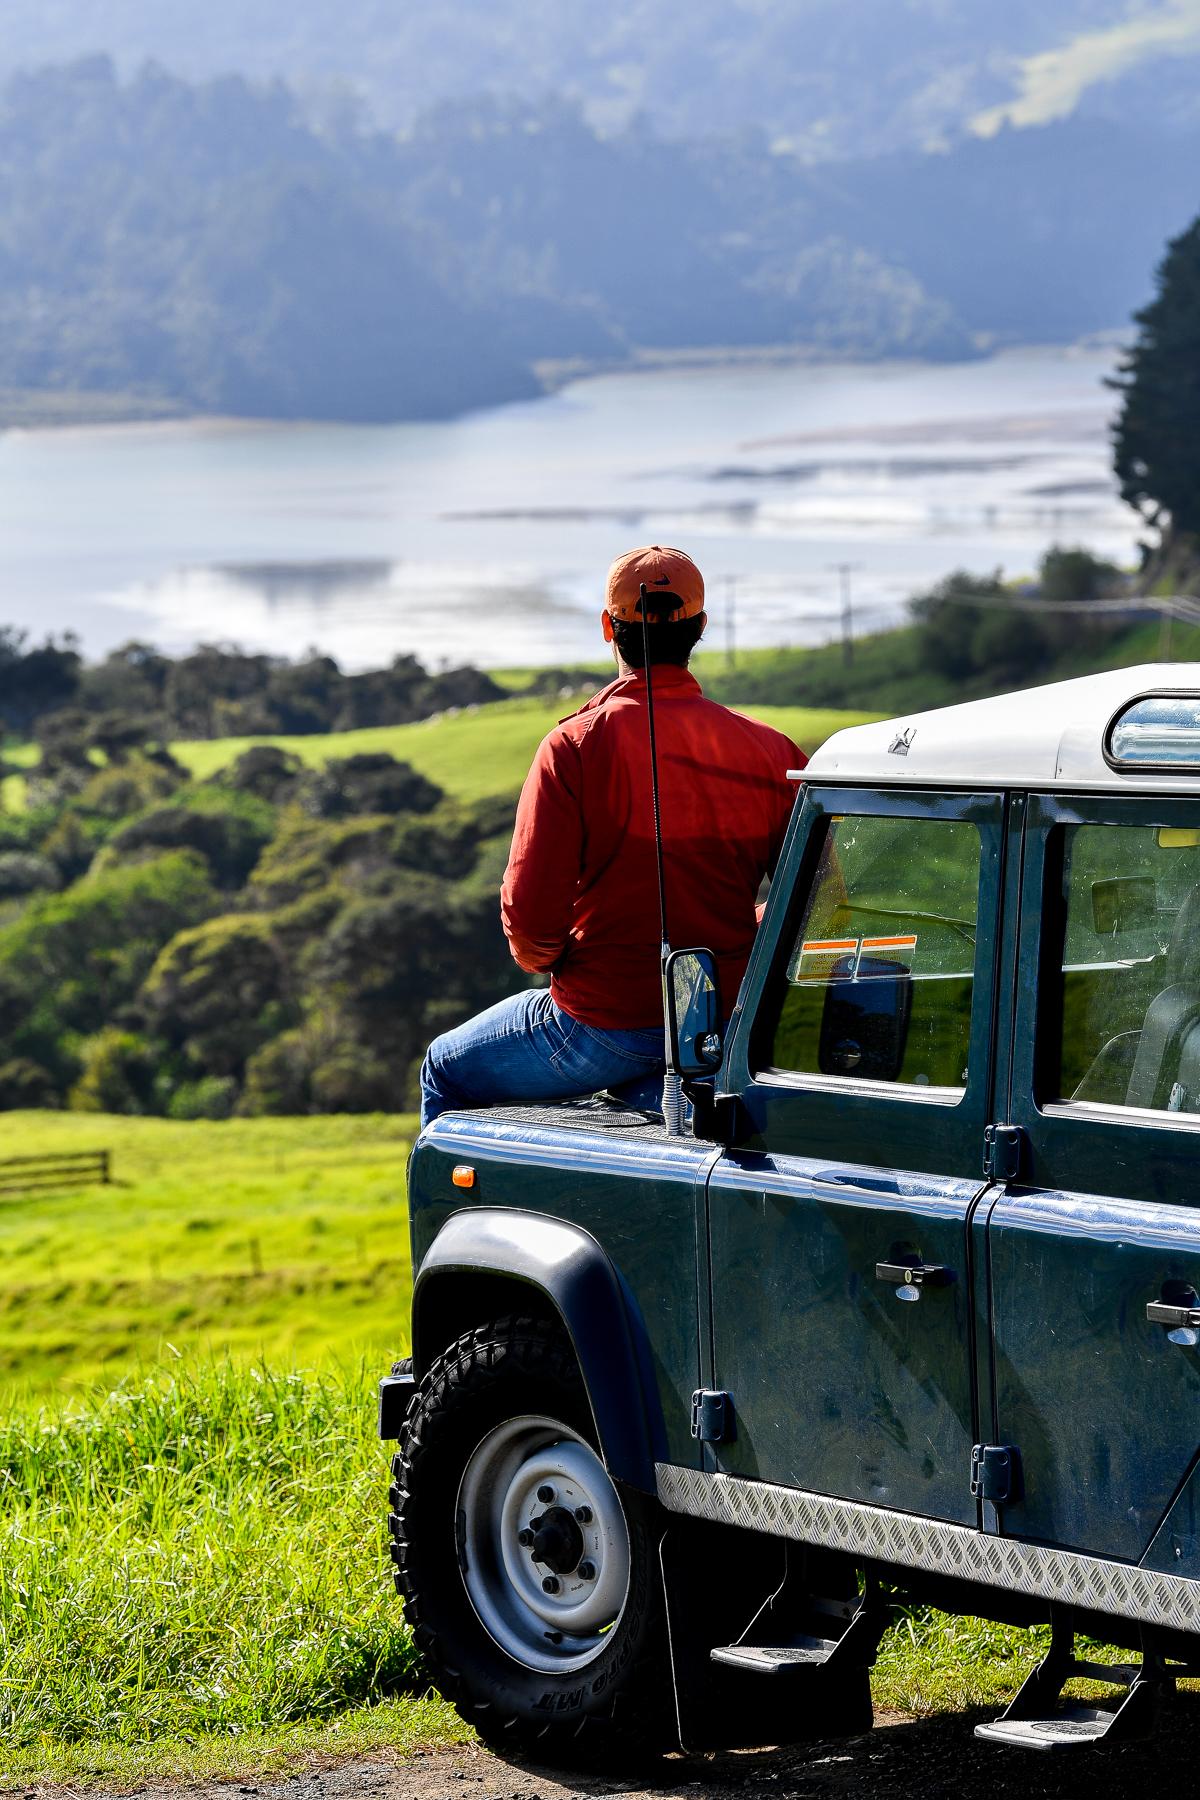 Stacie Flinner Land Rover Camping New Zealand-9.jpg